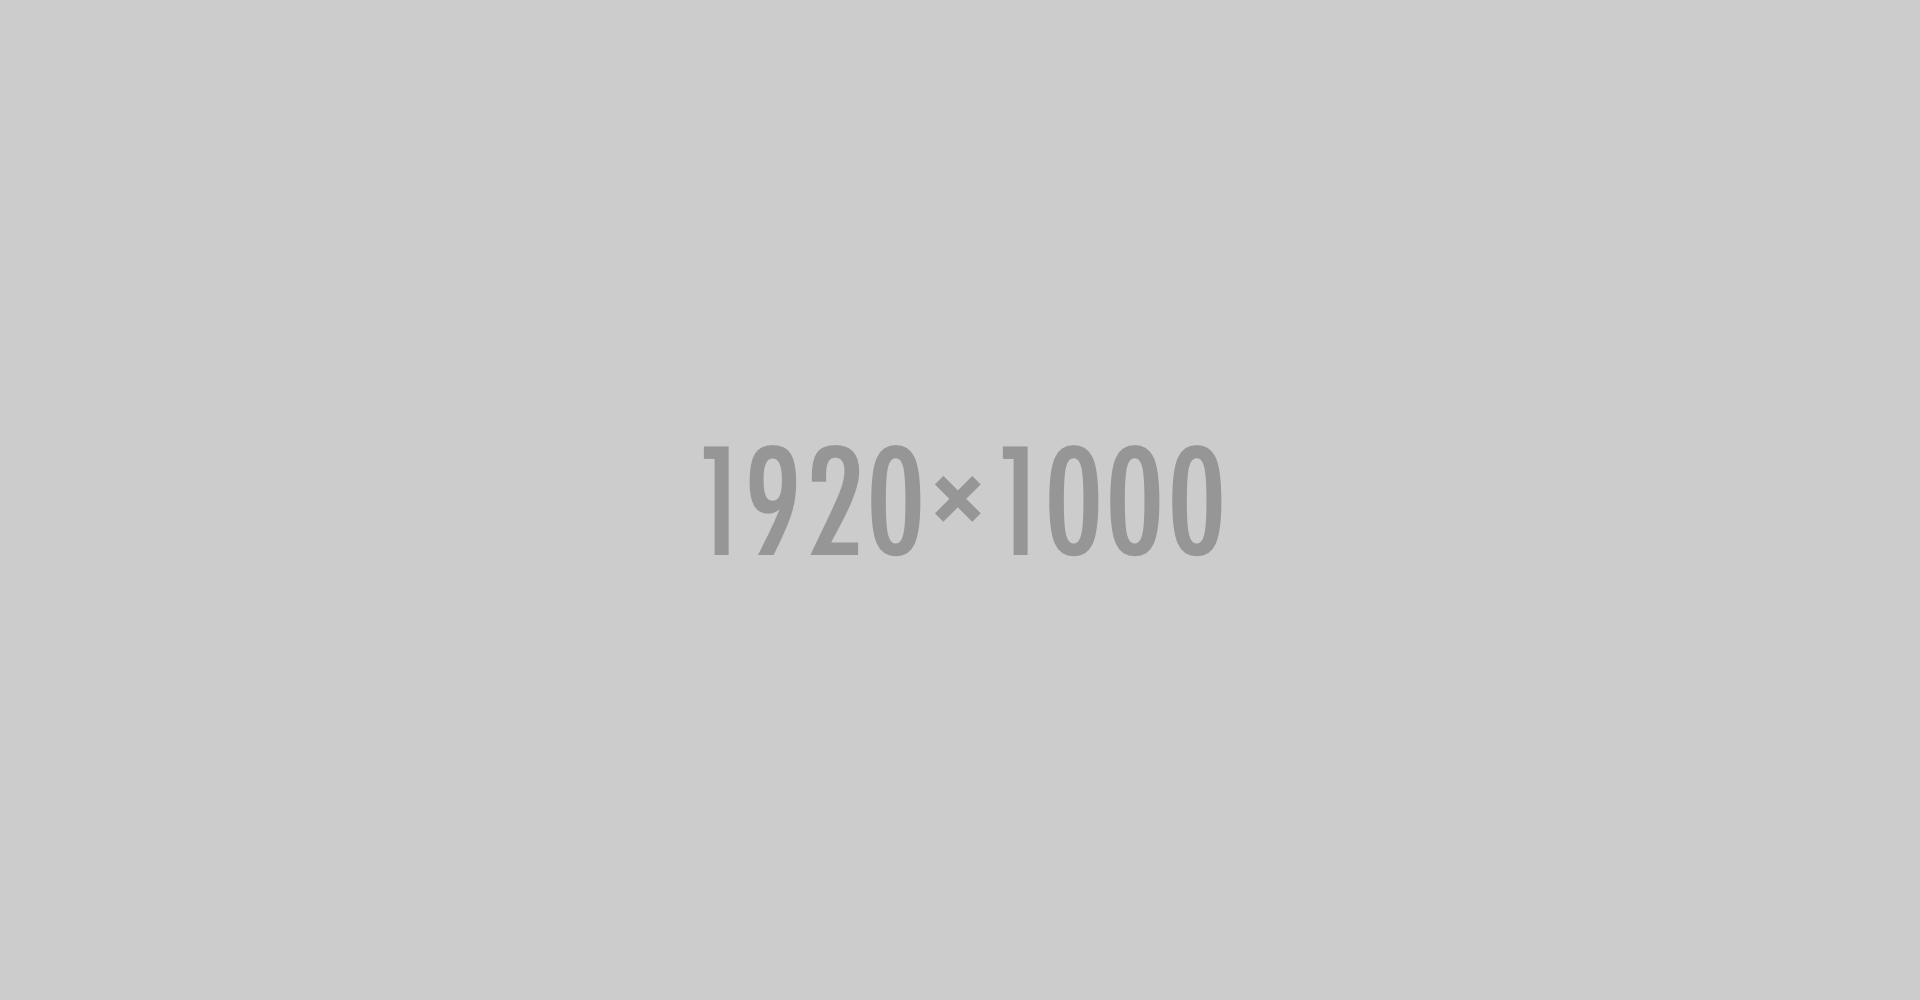 1920x1000